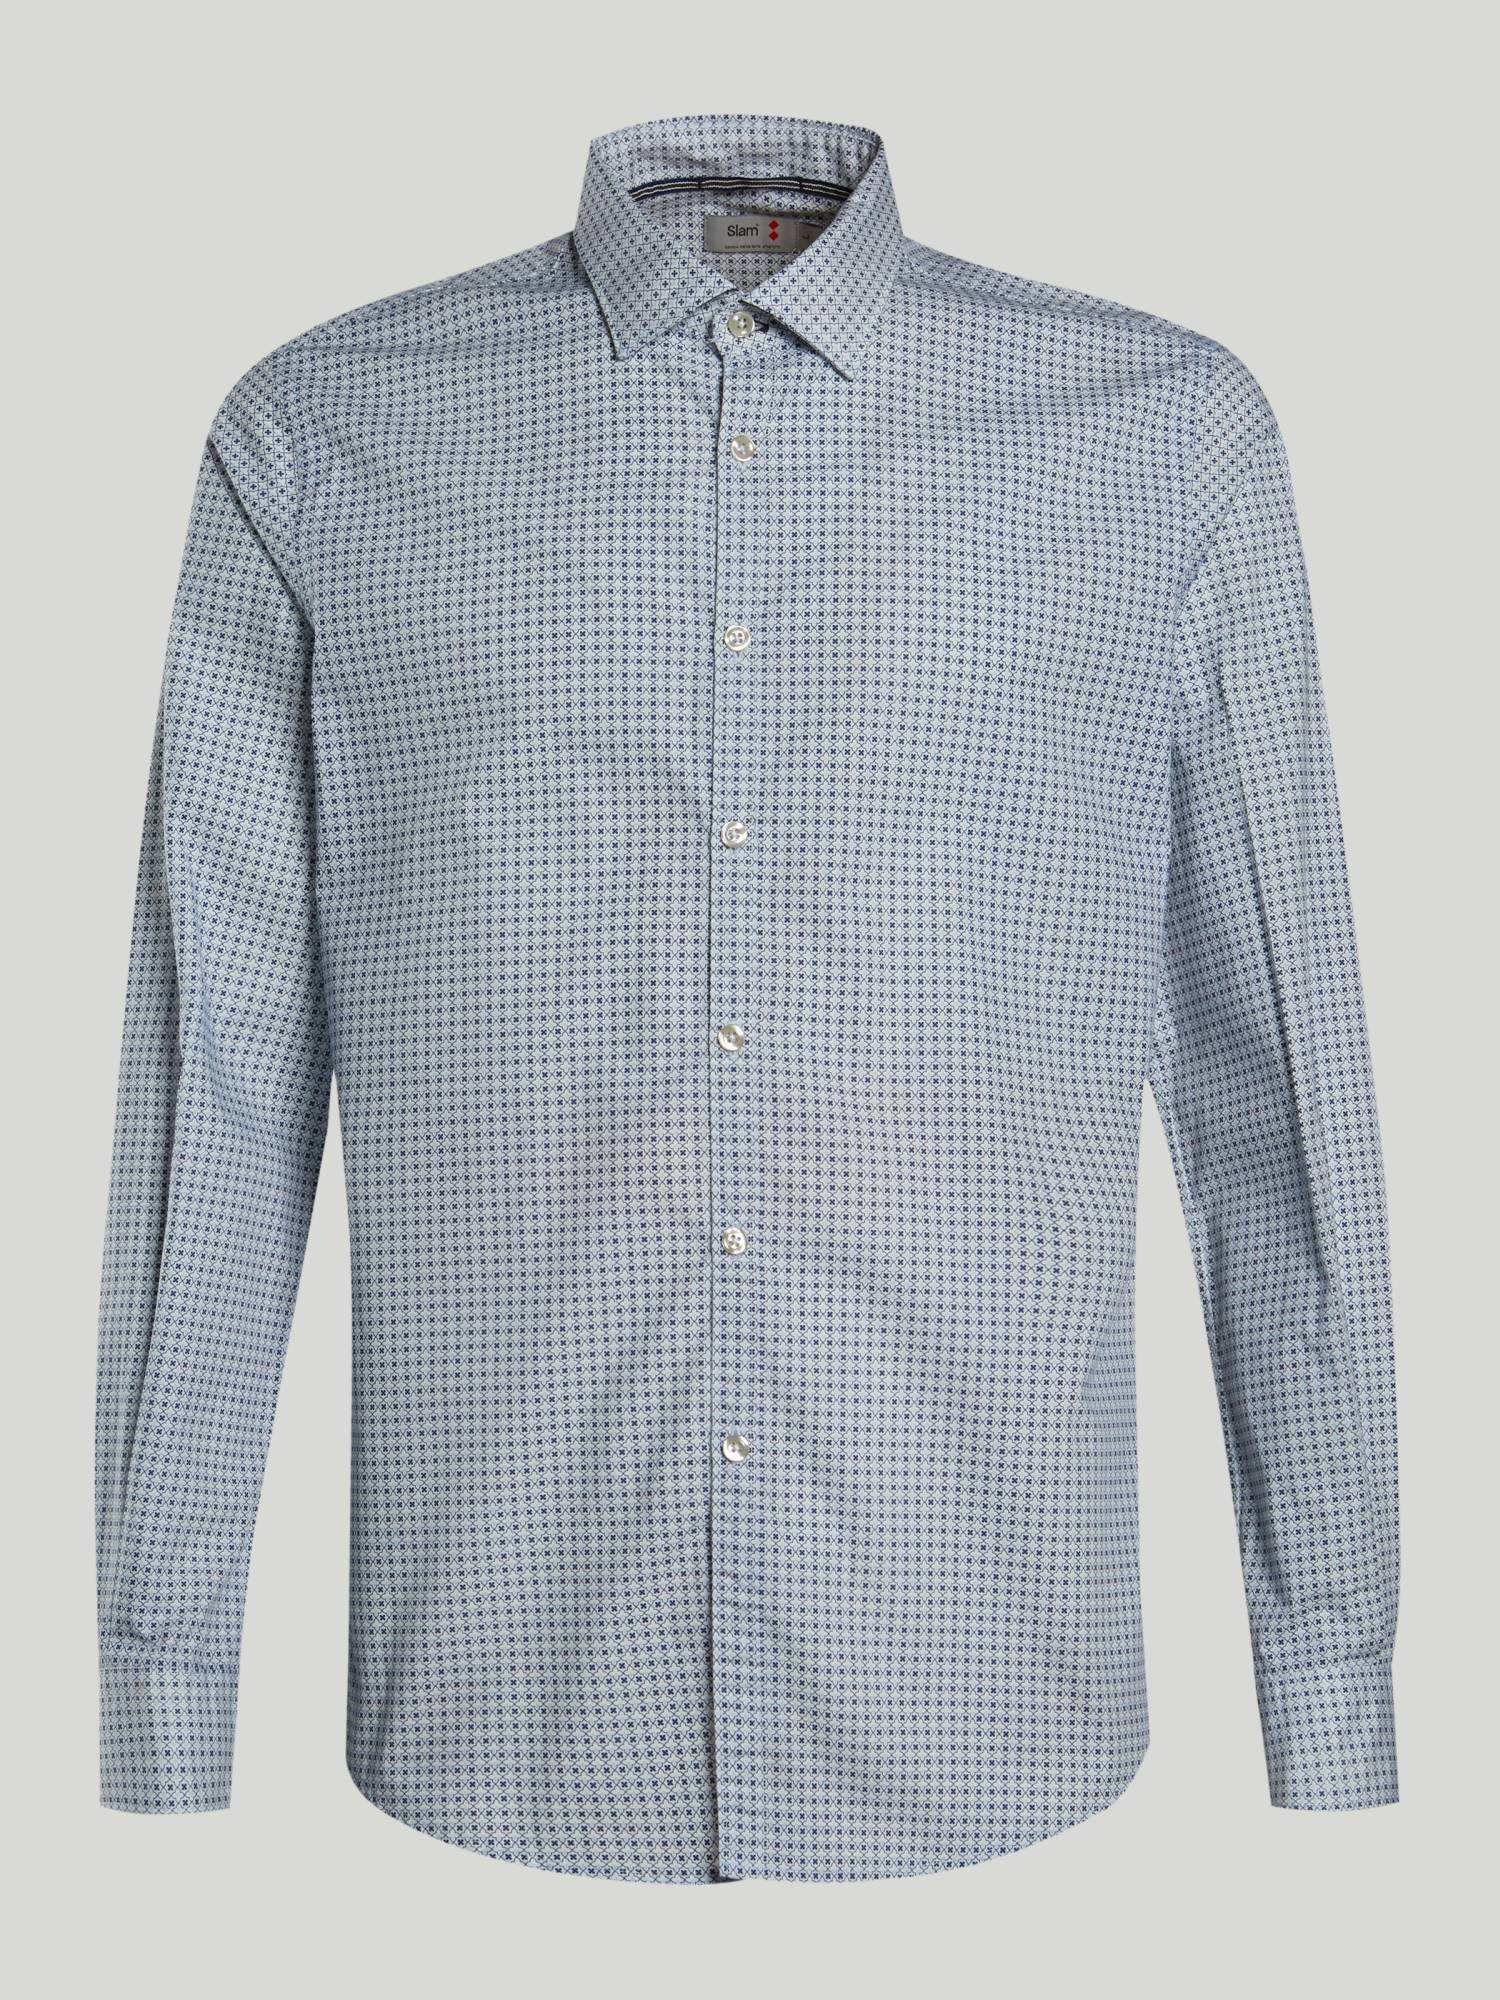 Shirt A149 - Blanco / Azul Marino